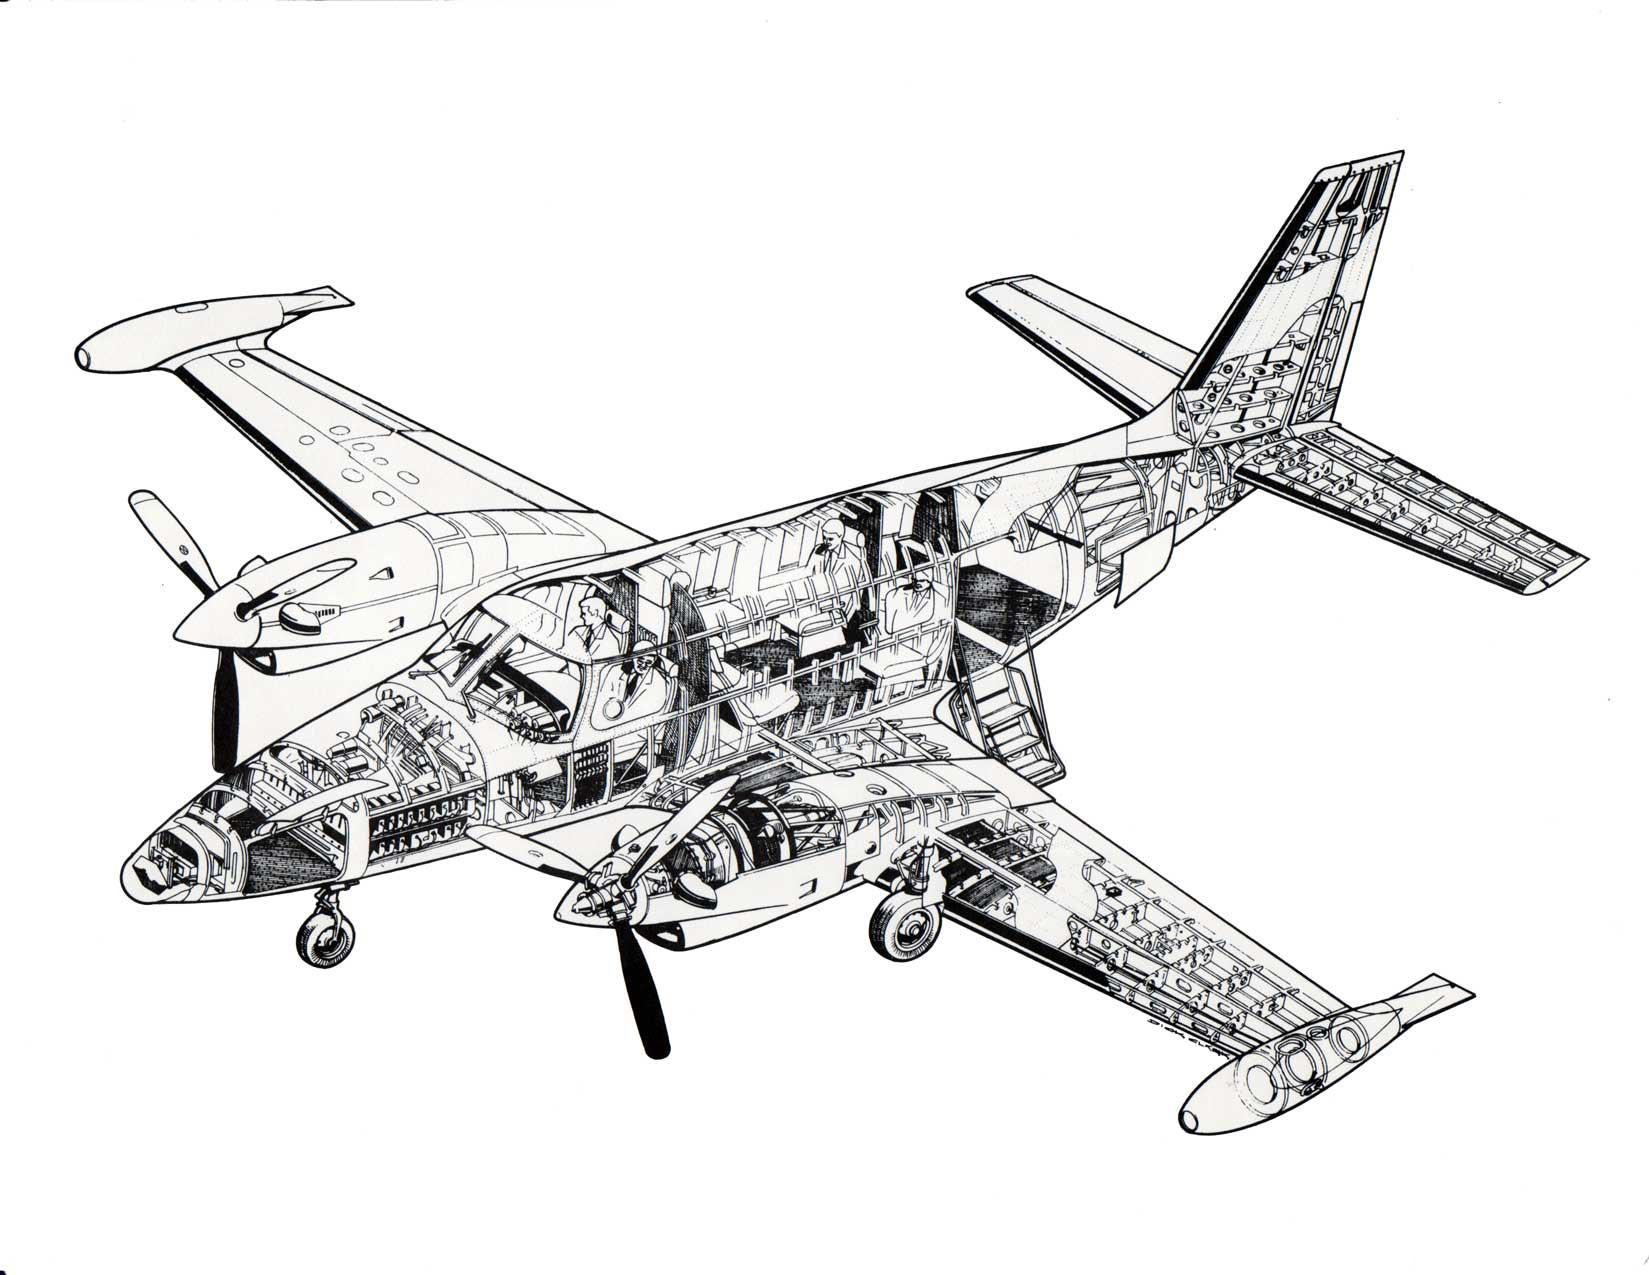 Piper Pa 31t Cheyenne Cutaway Drawing In High Quality